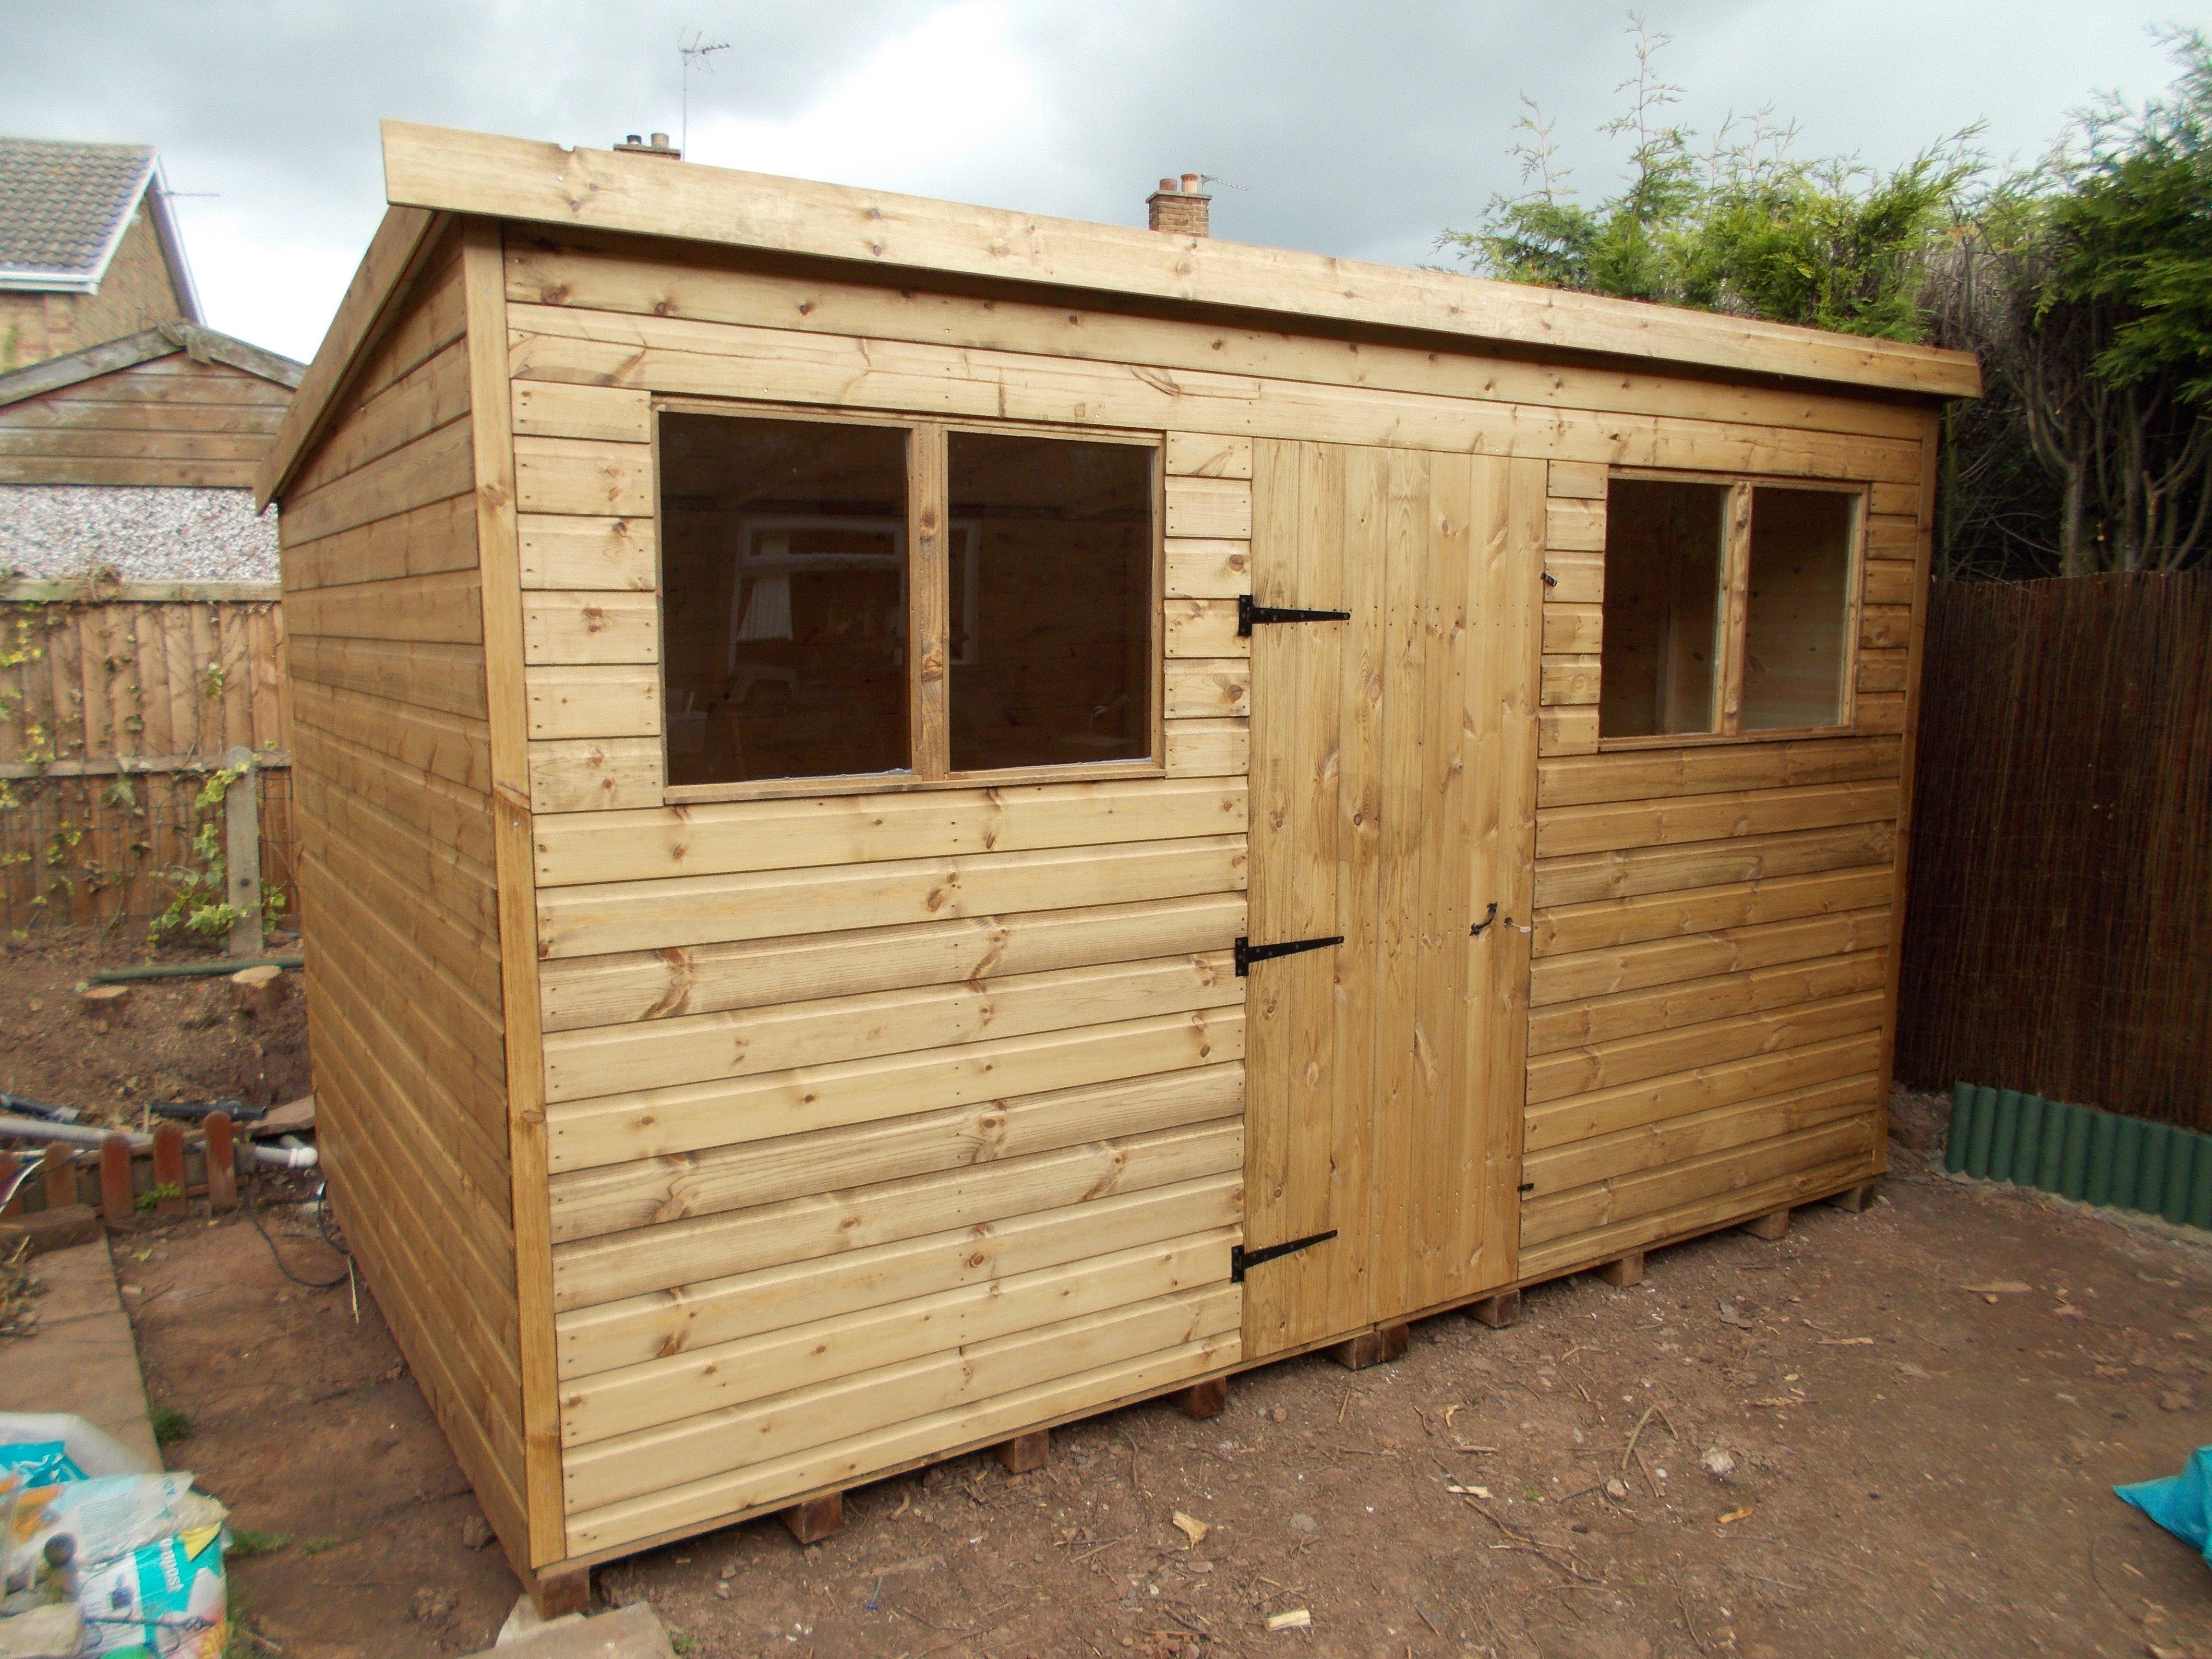 Garden Sheds Nottingham outbuildings sold across nottingham at sherwood shed company